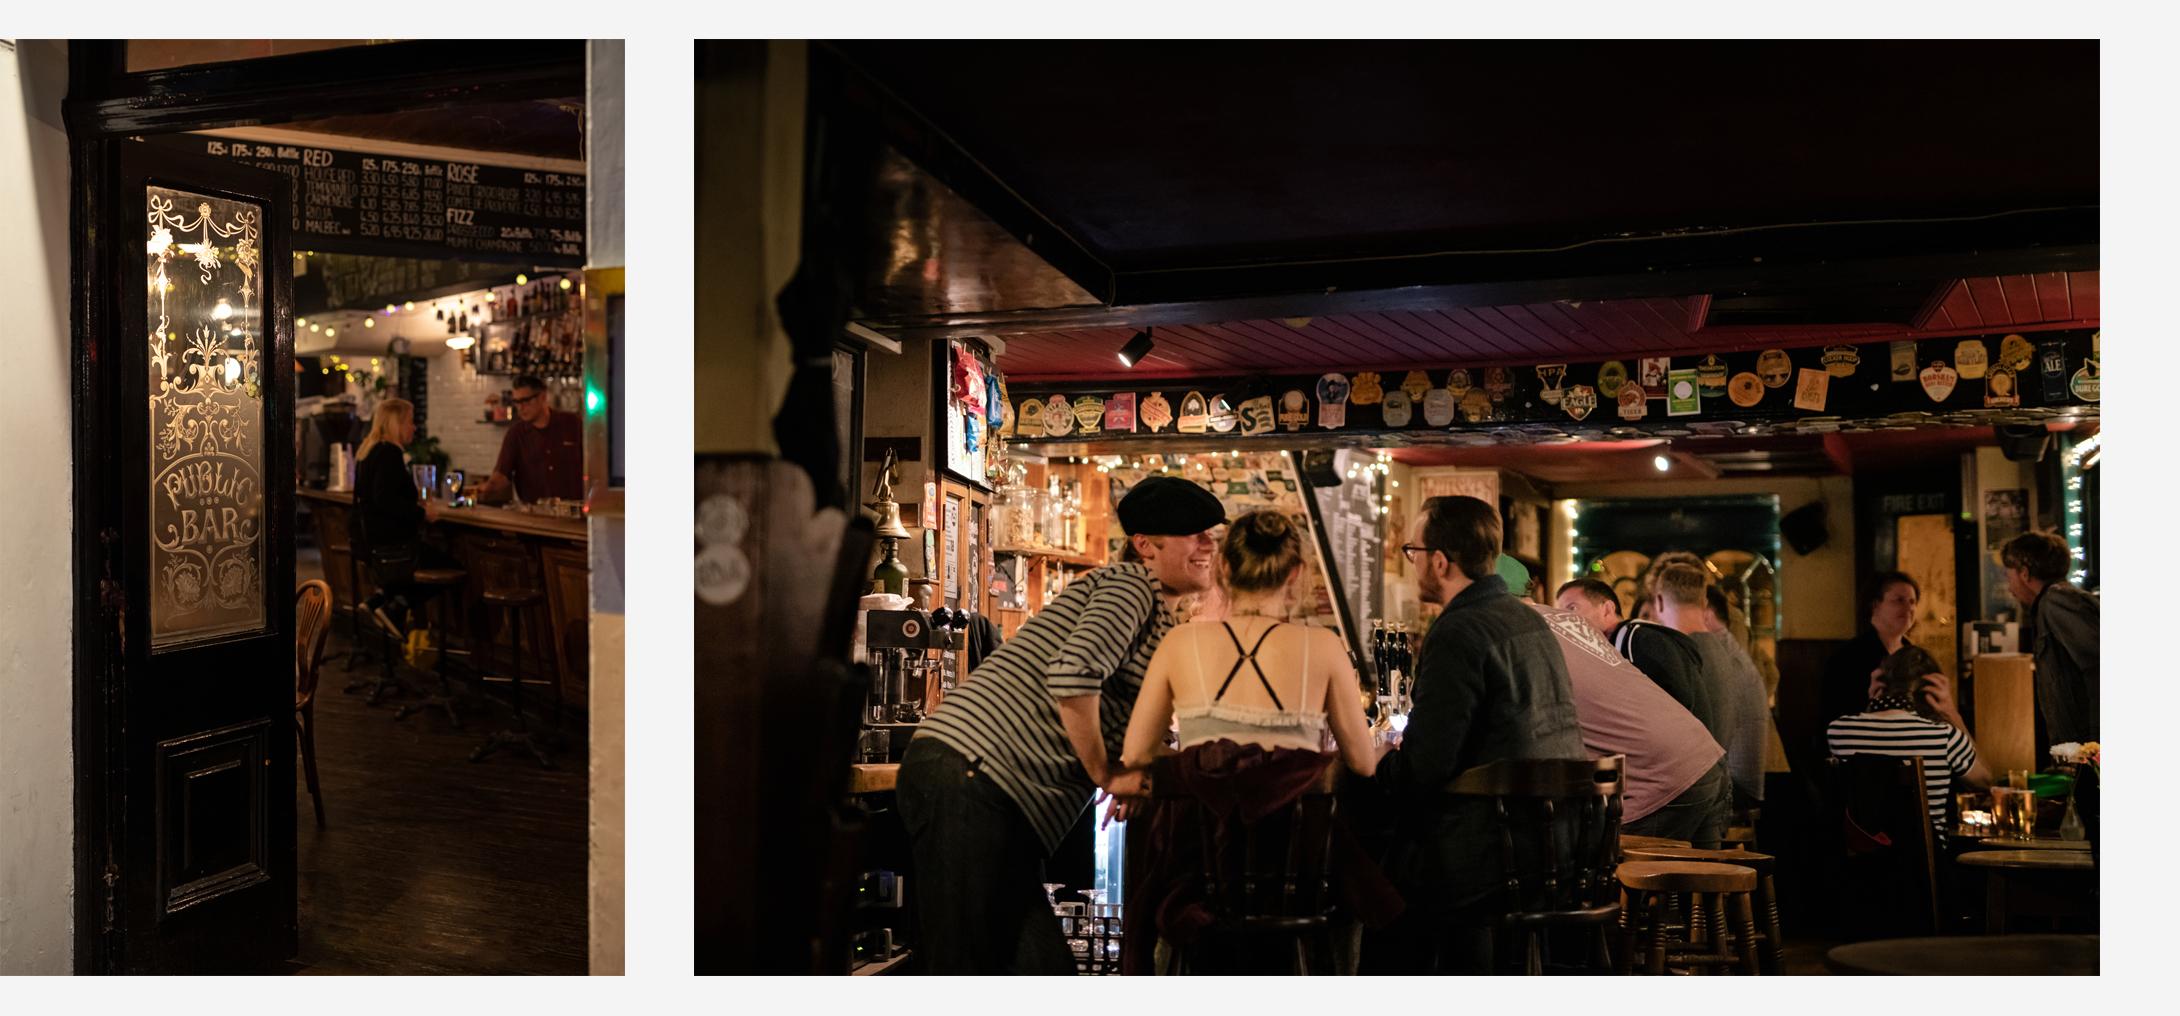 onthenorway brighton pub england